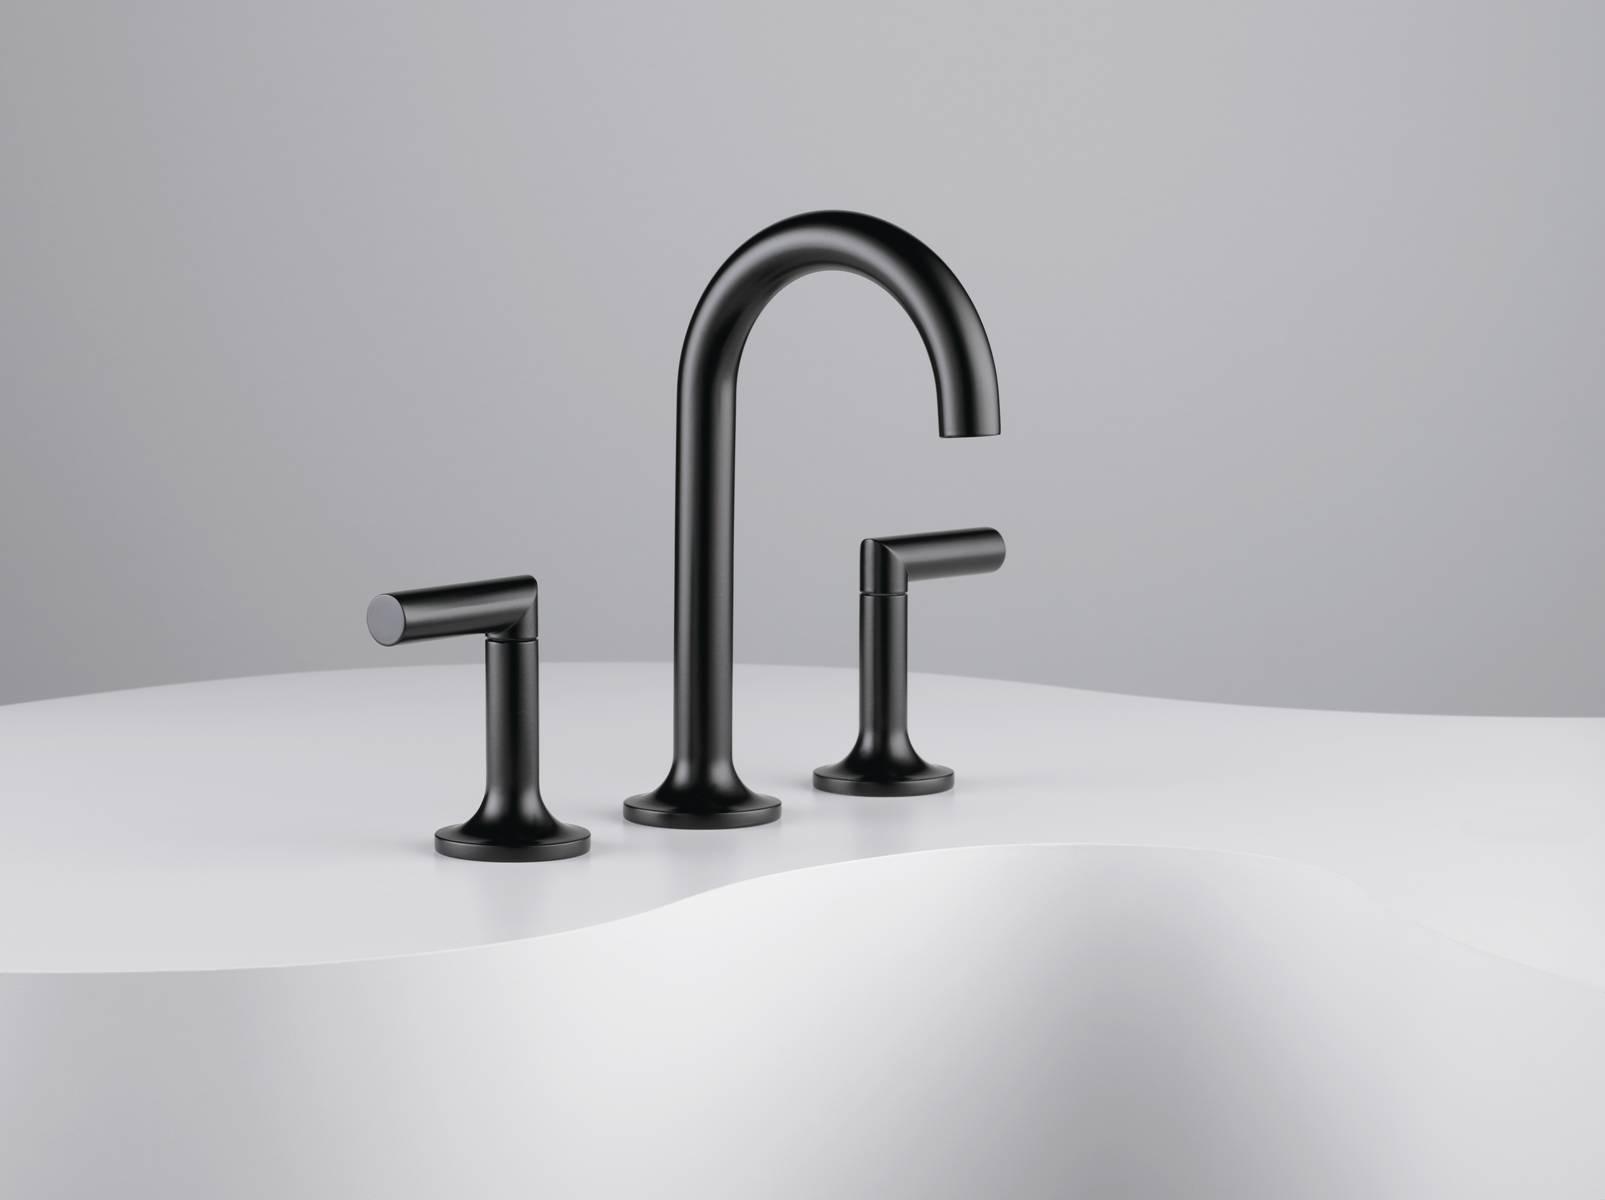 Jason Wu for Brizo bath collection | Pro Remodeler